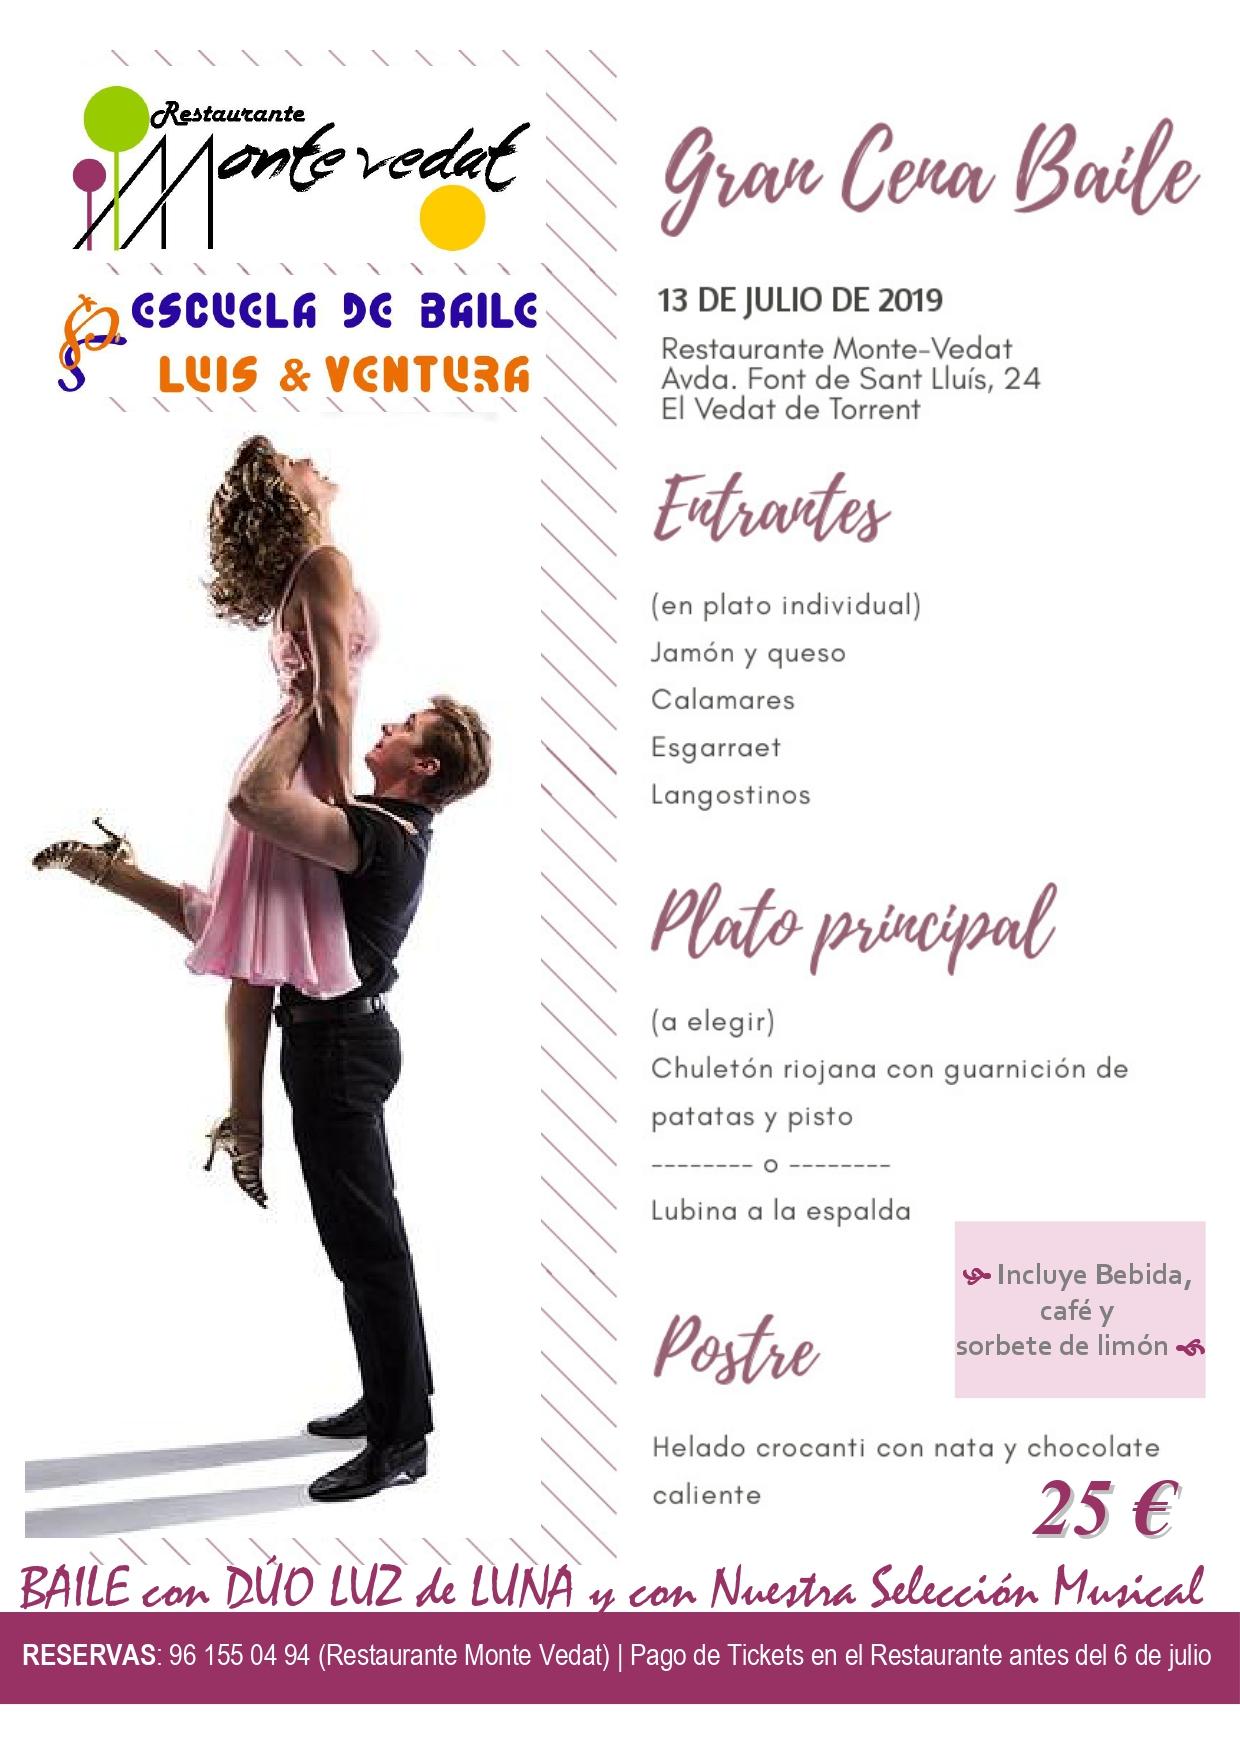 cena baile monte vedat 2019_page-0001